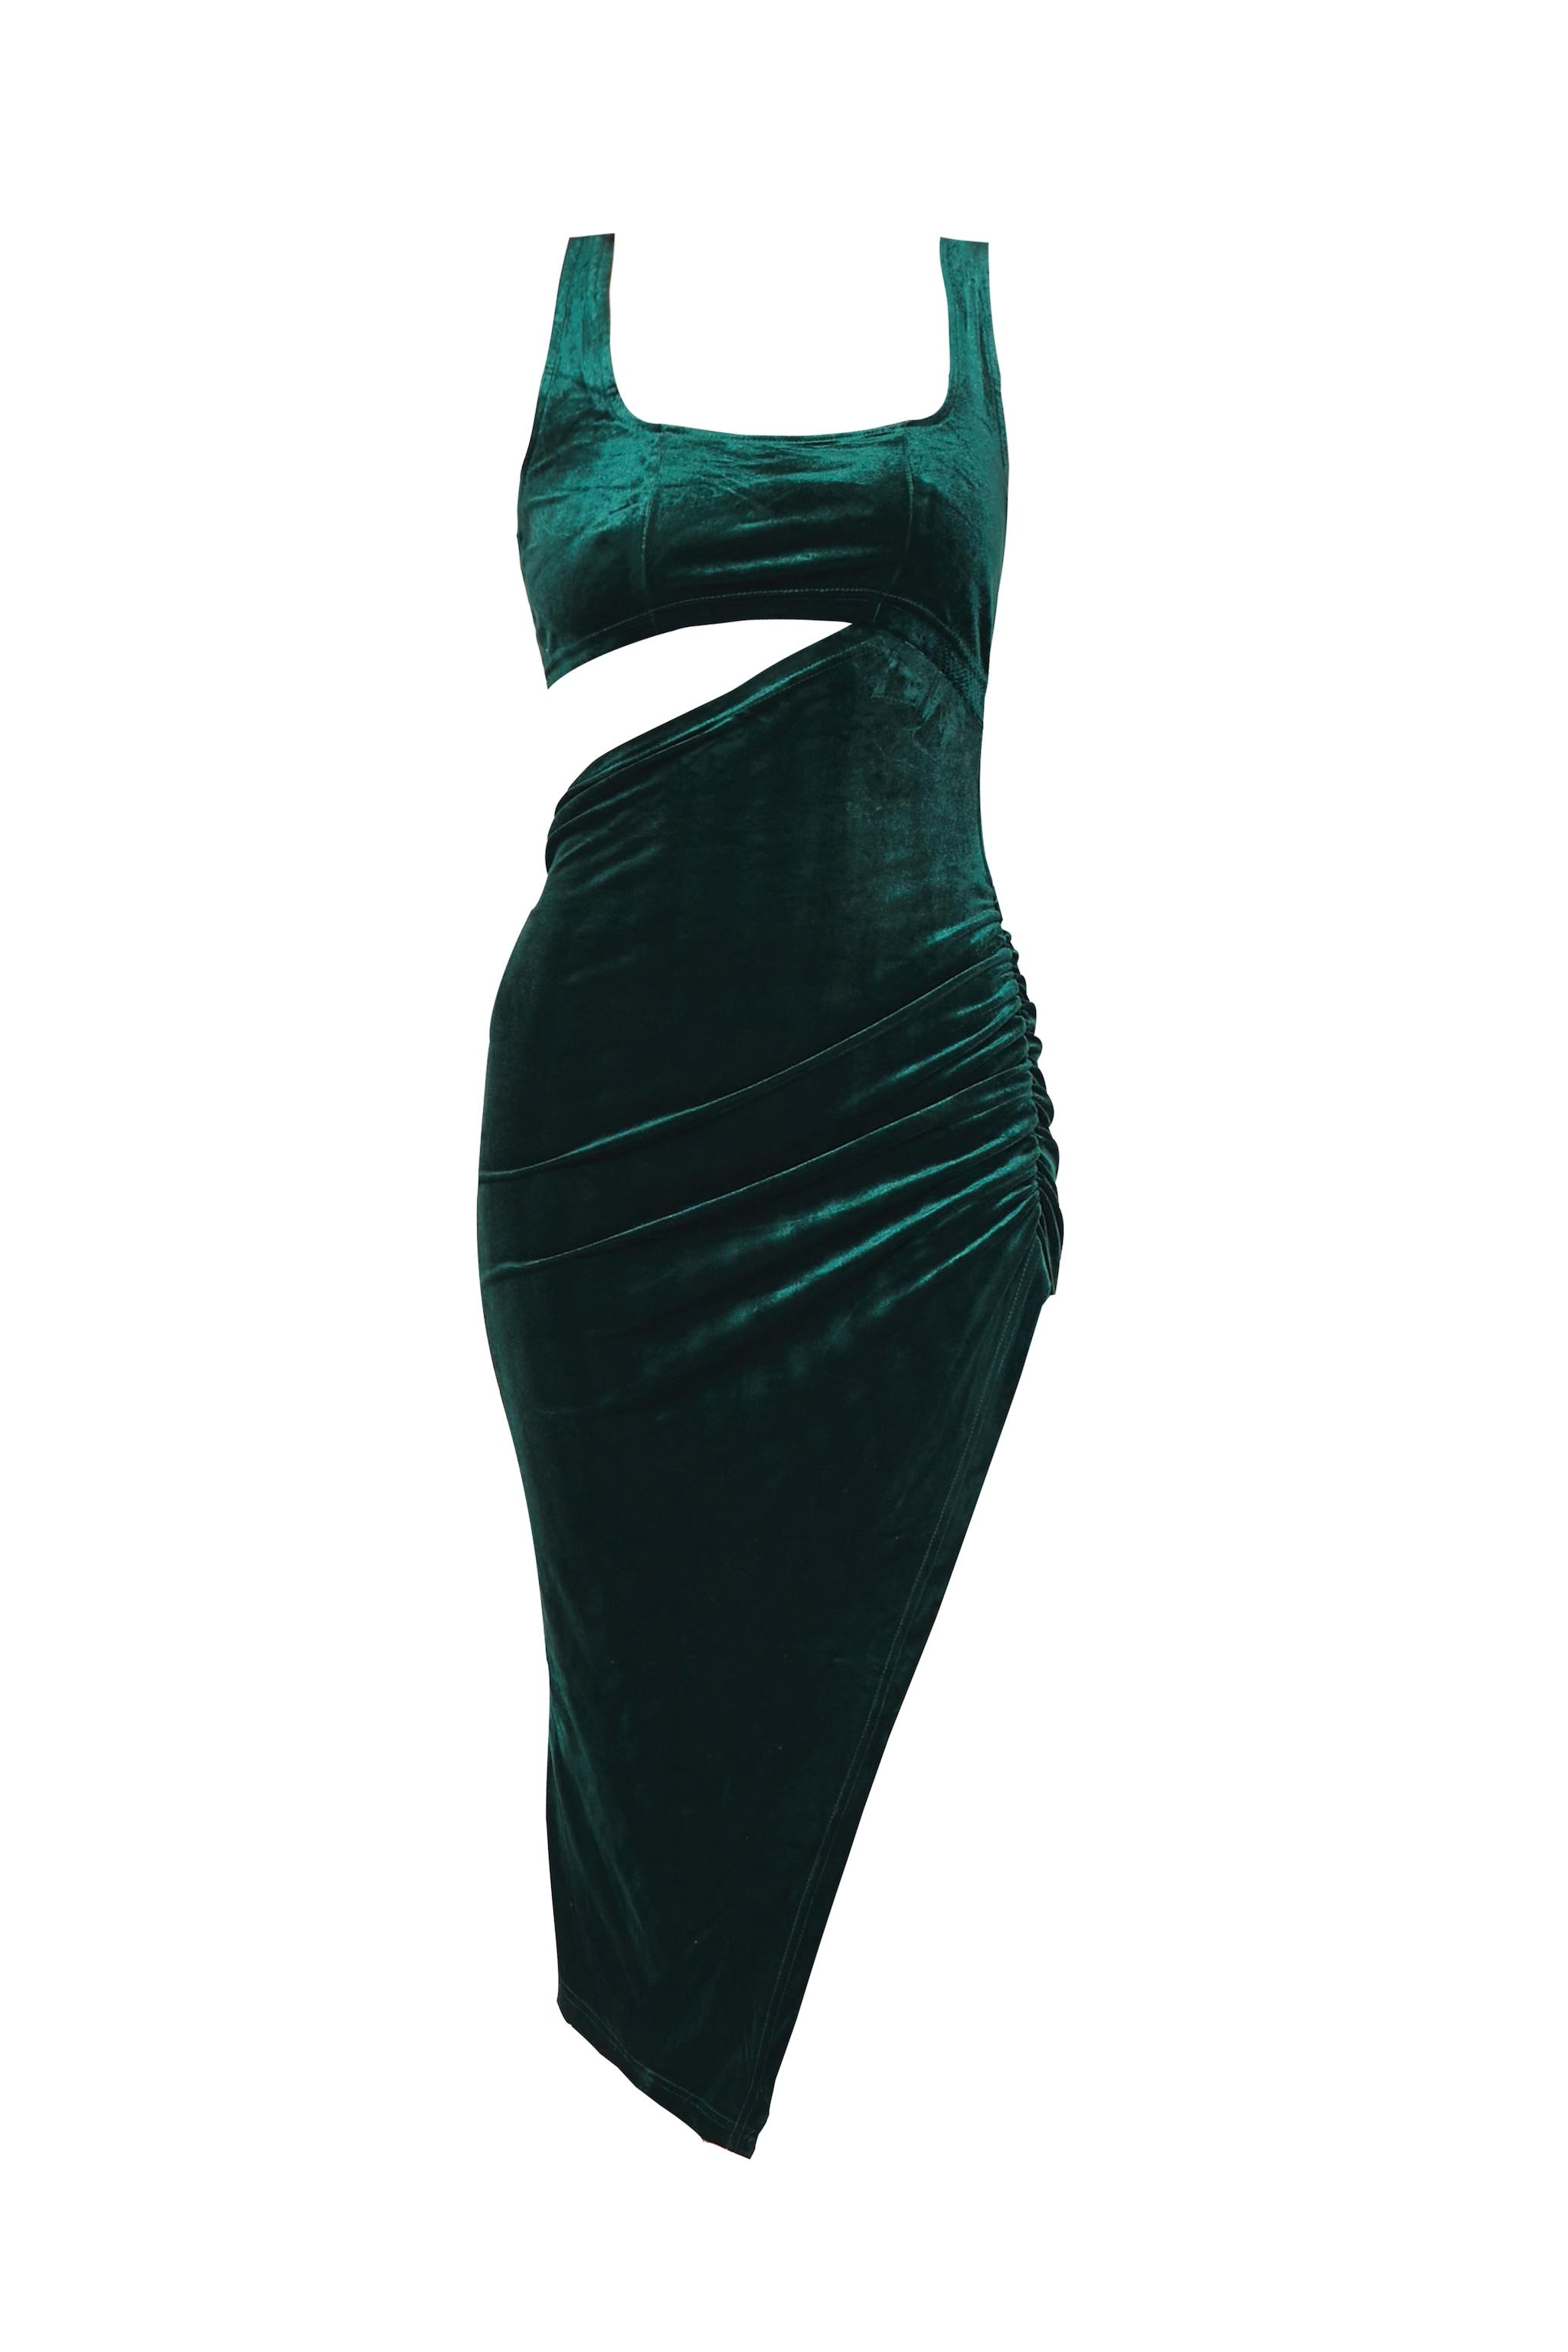 Emerald Green Velvet Sleeveless Cut Out Midi Dress 5